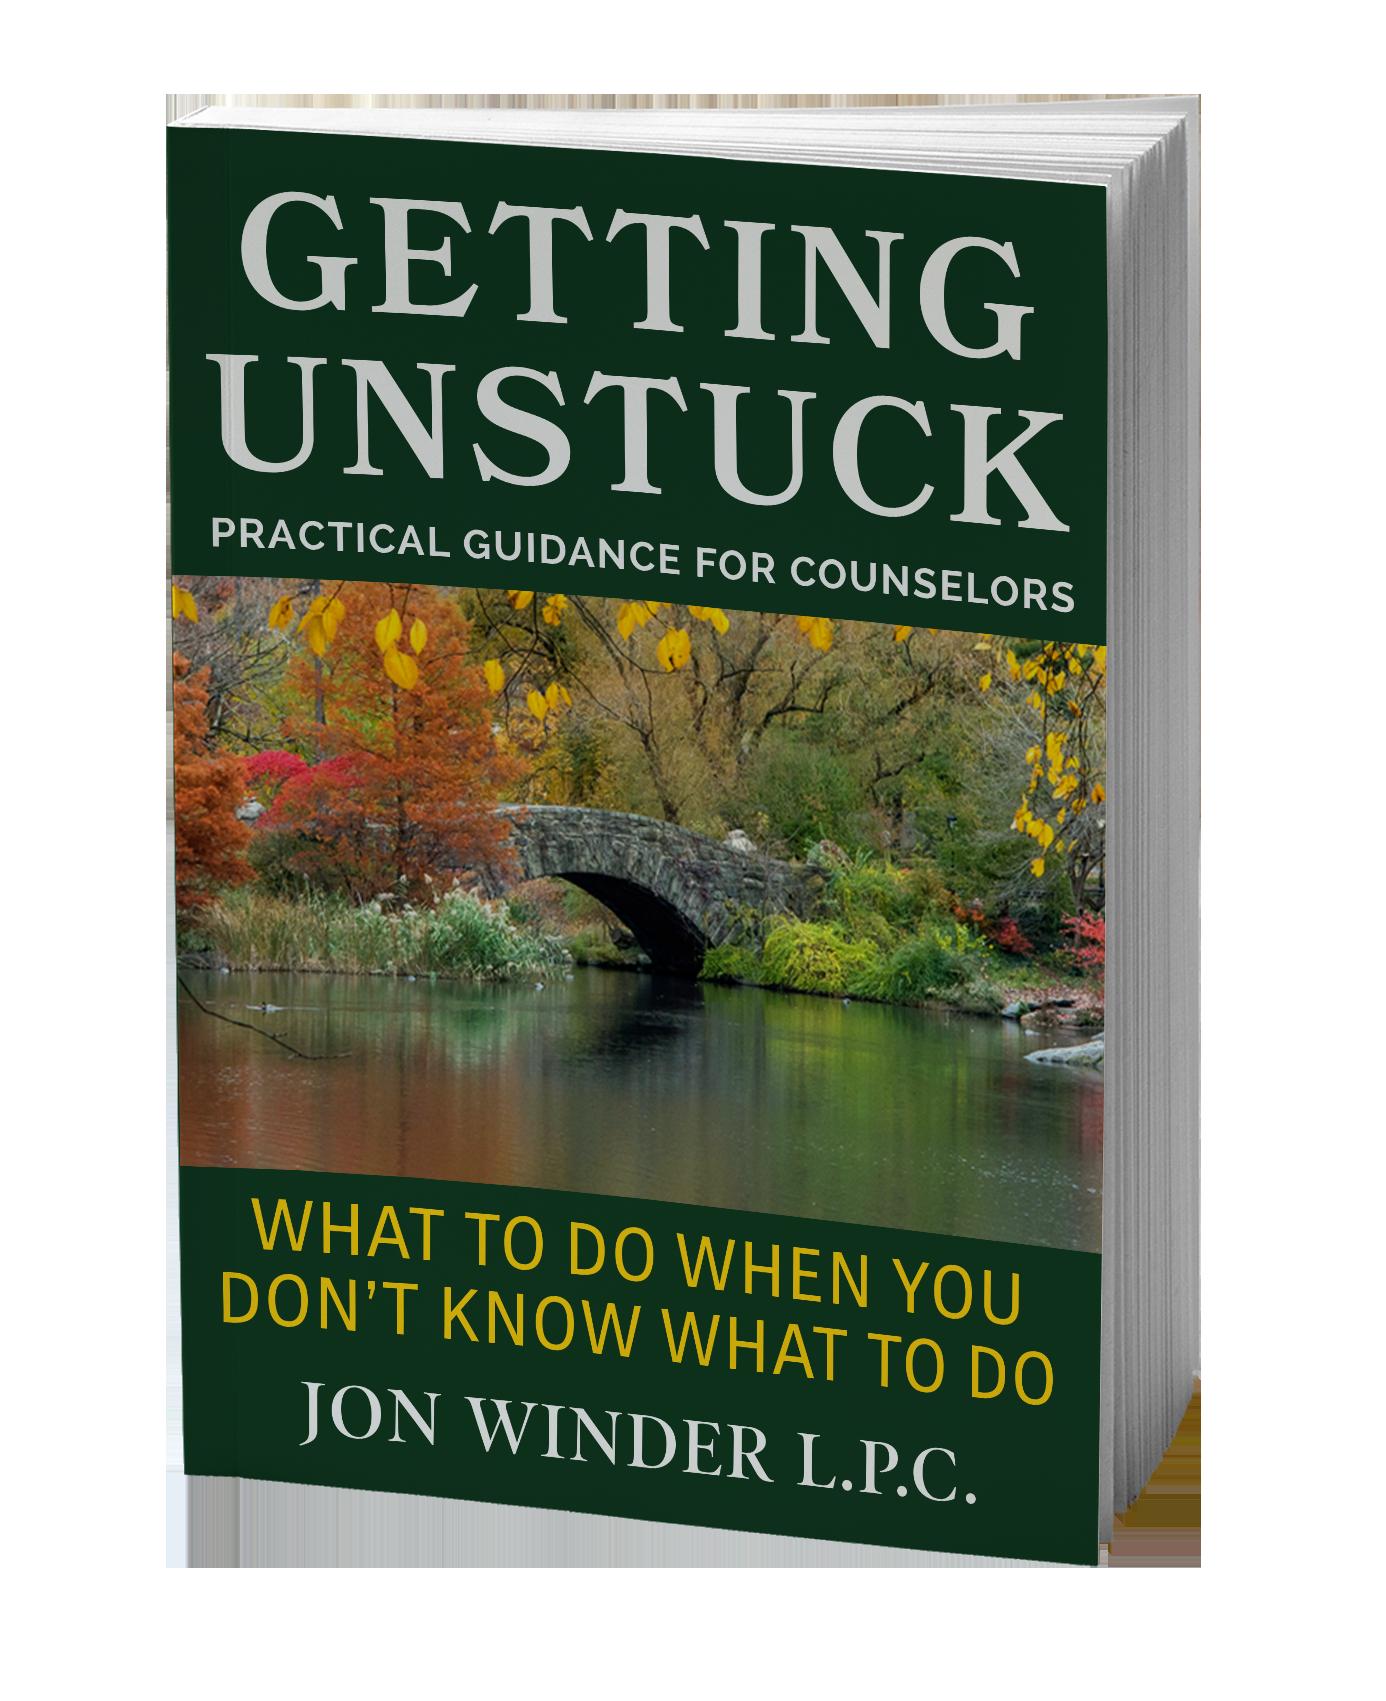 Getting Unstuck, Jon Winder